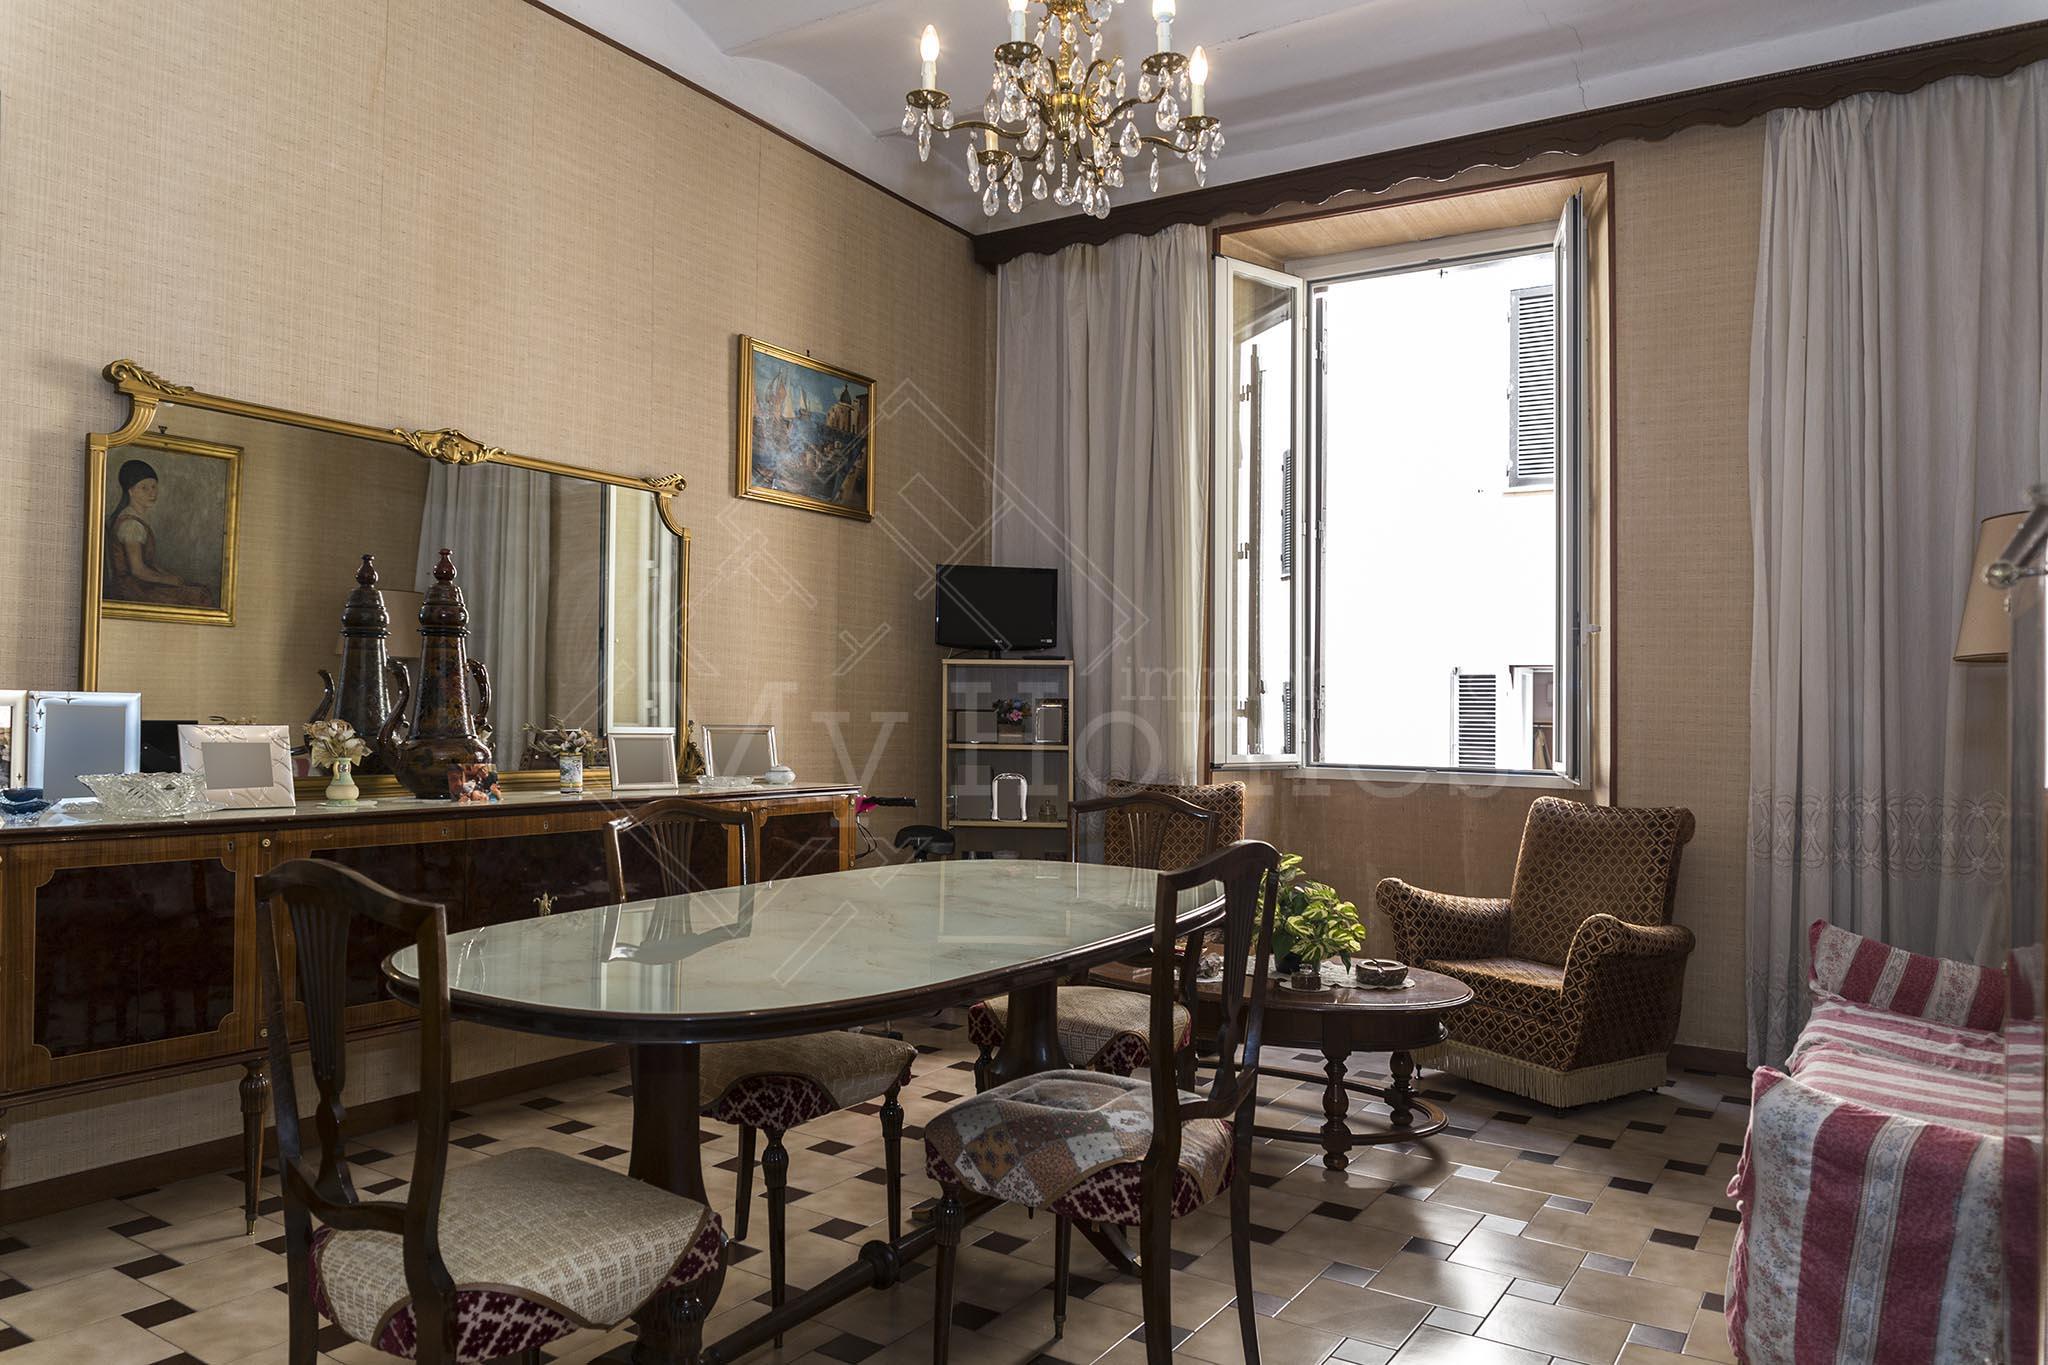 Appartamento Via Zara, Trieste/Salario